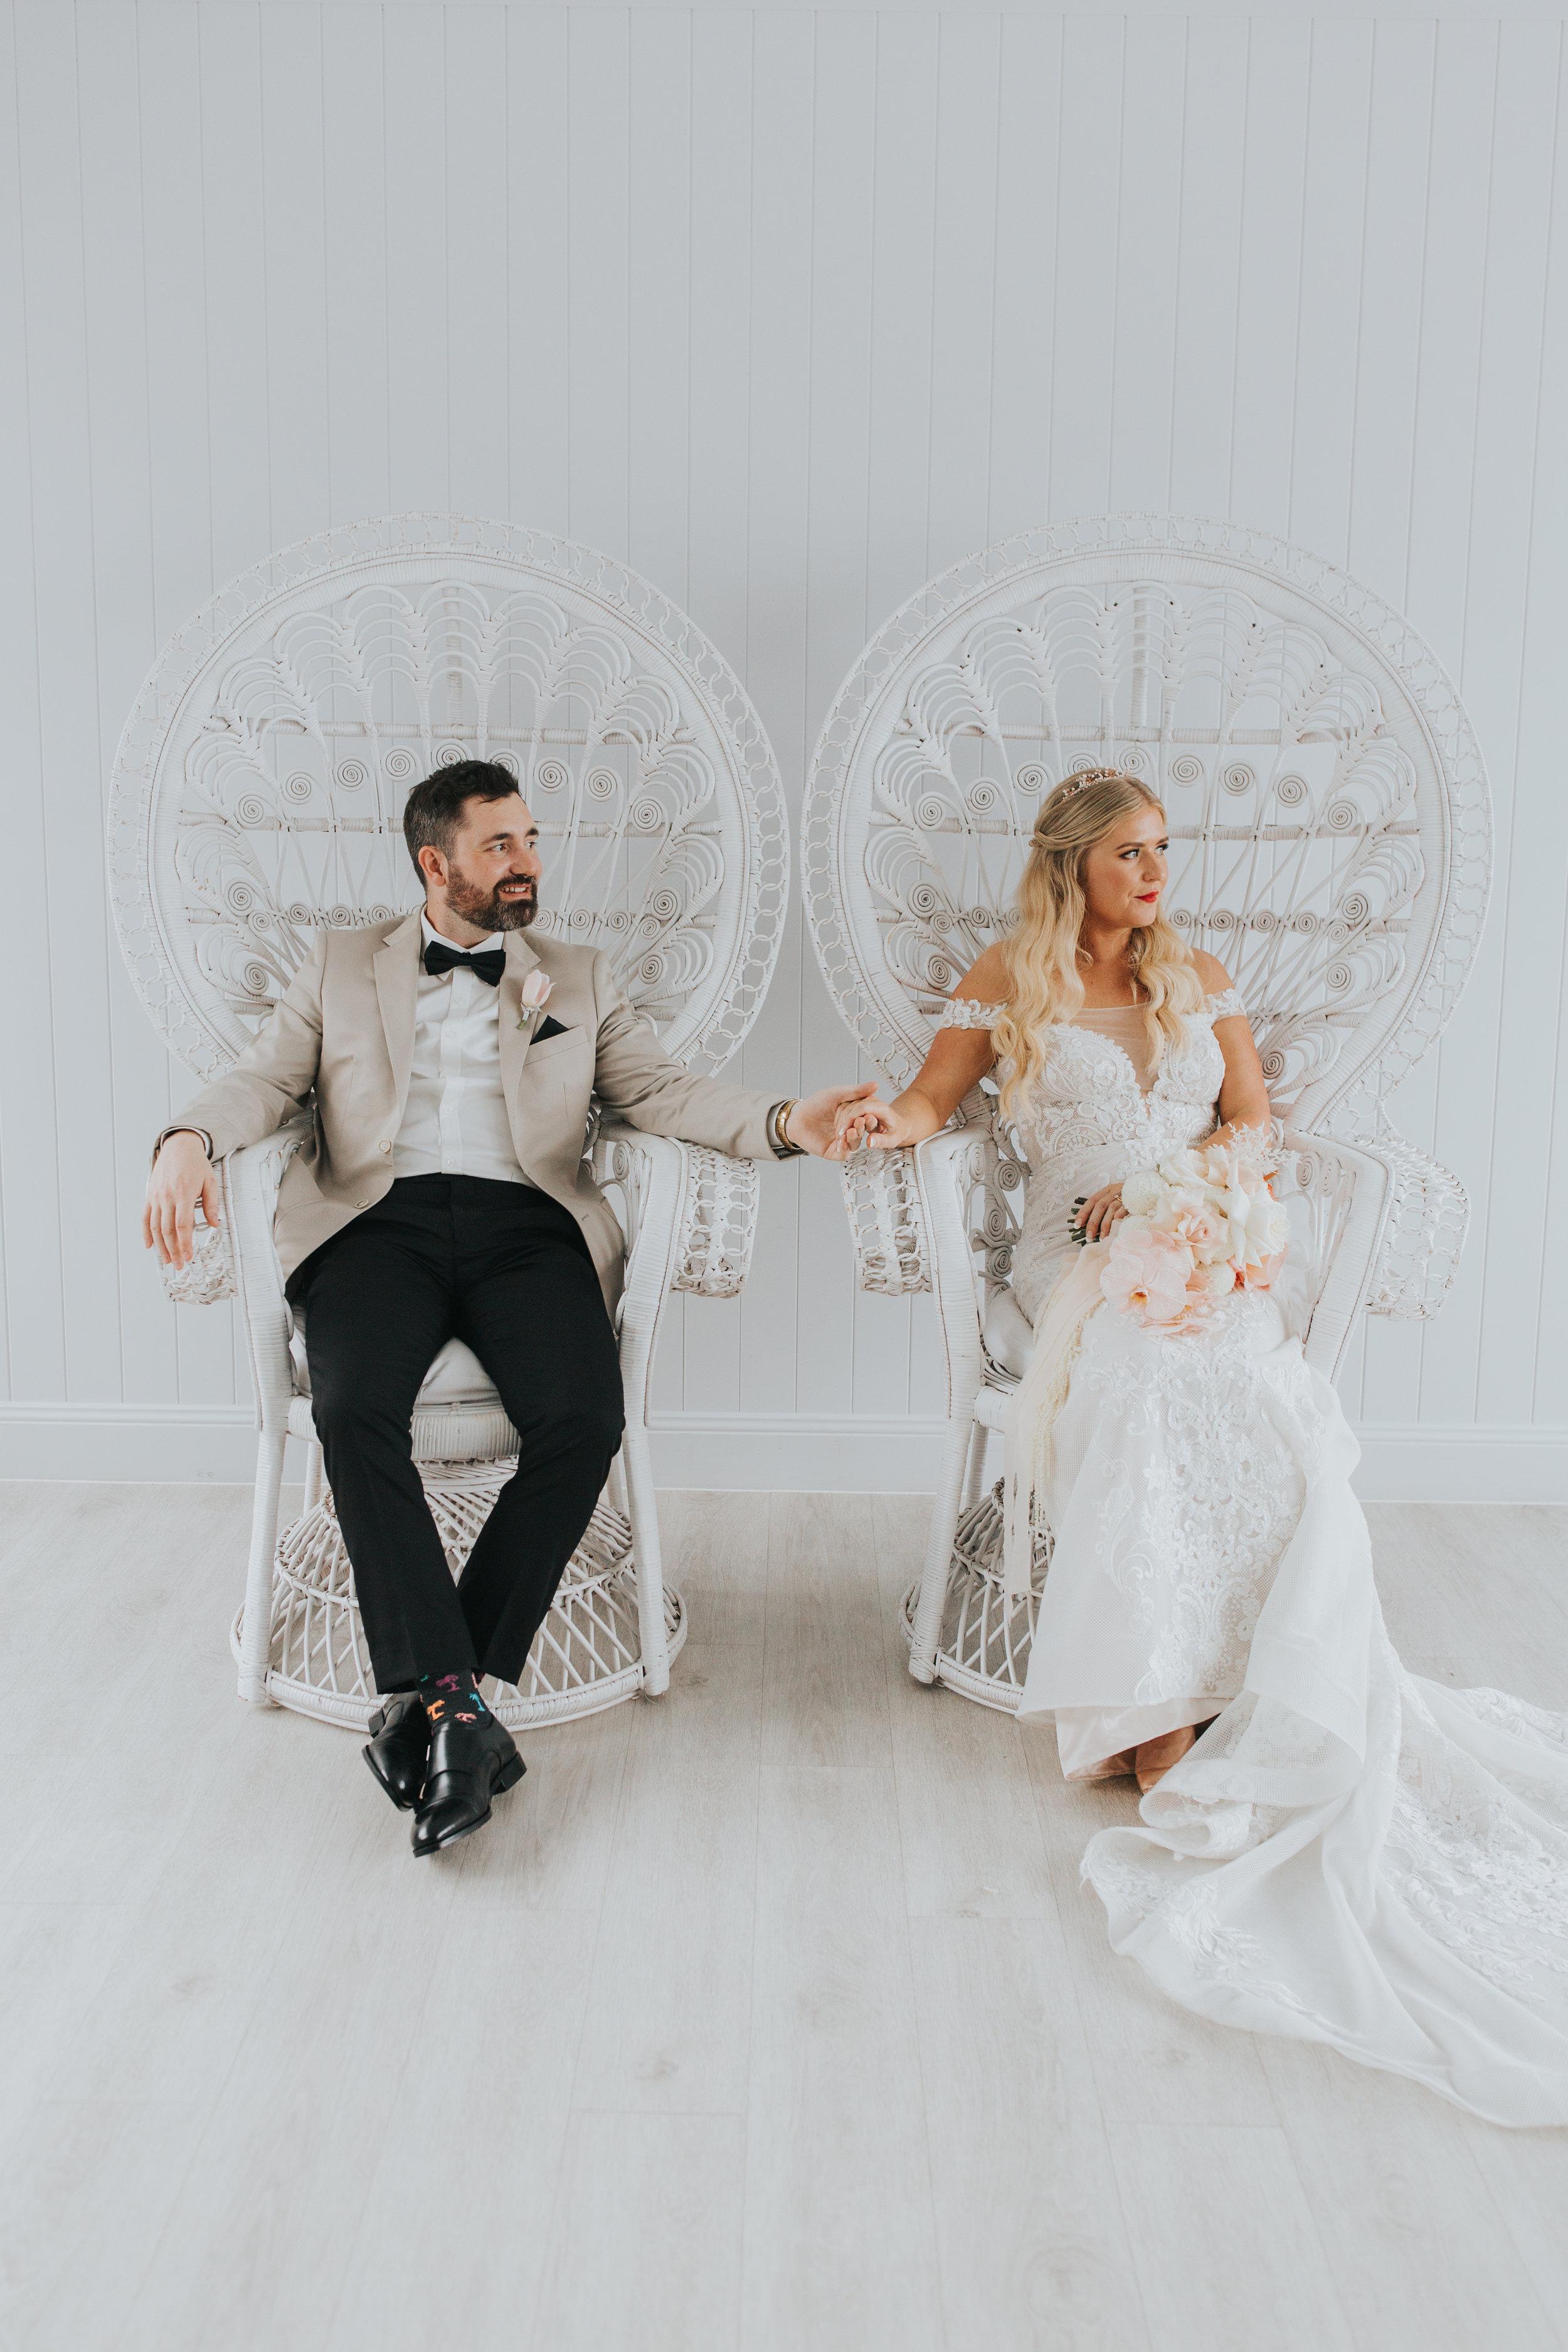 Gavin & Renee - wedding